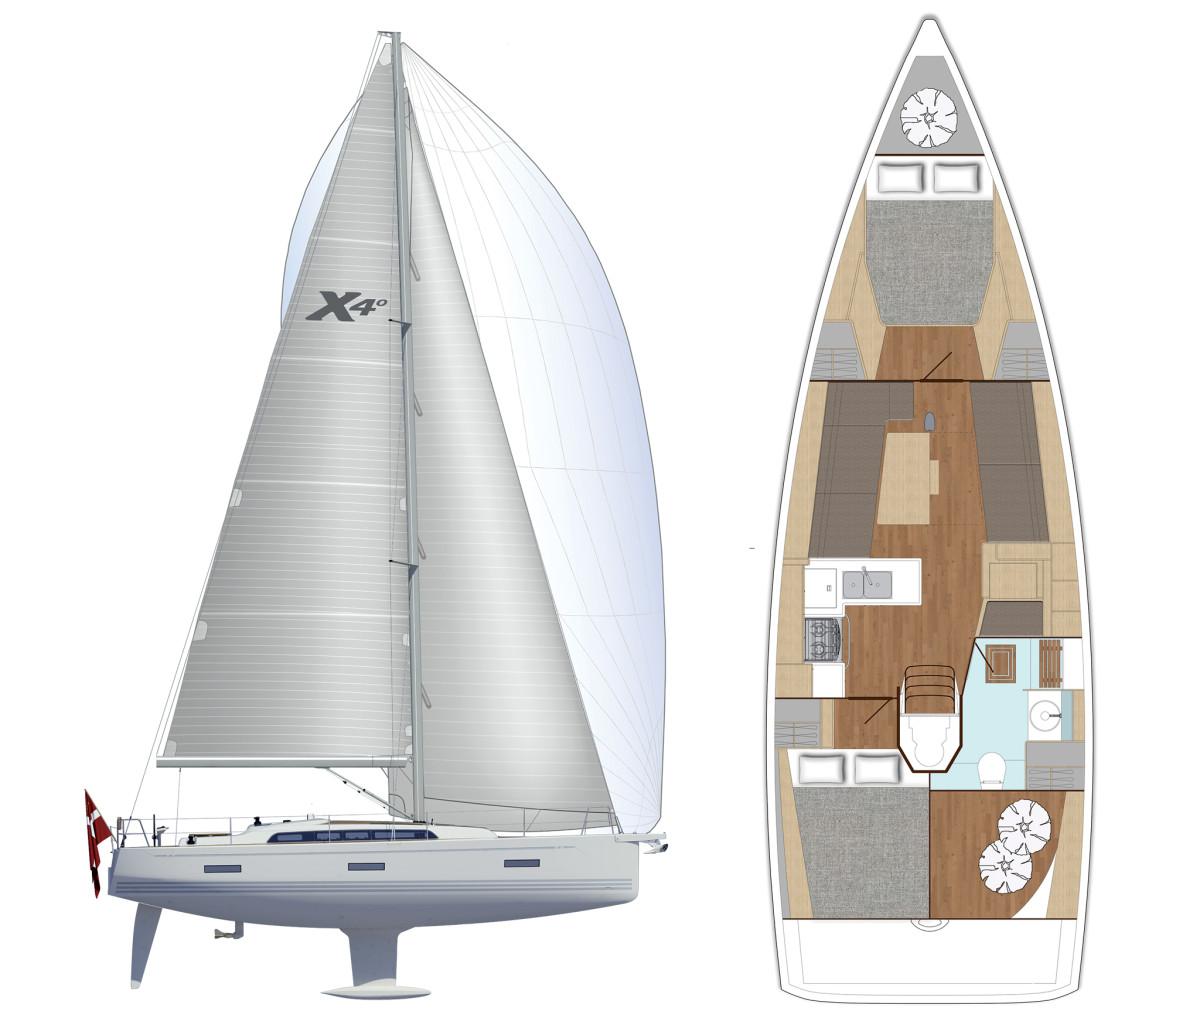 X4.0-Sailplan